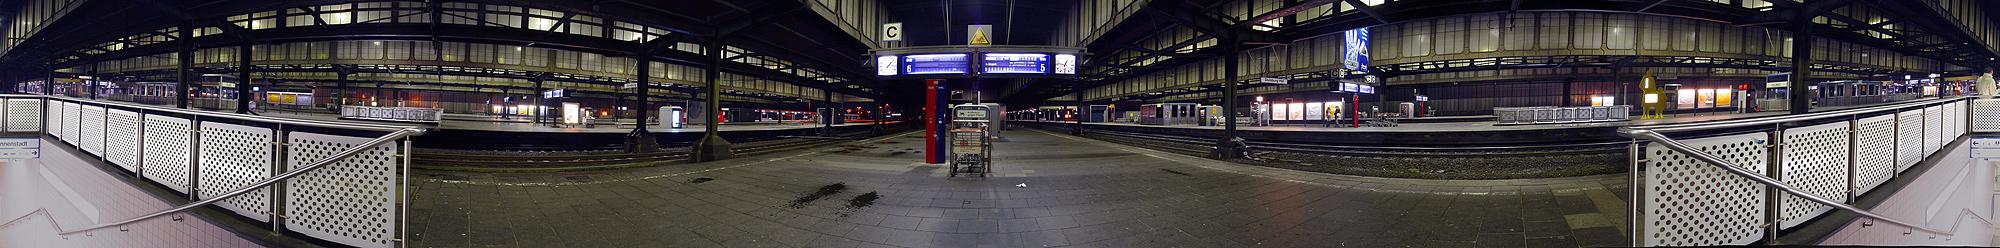 Gleis 6 / 5 - Duisburg HBF